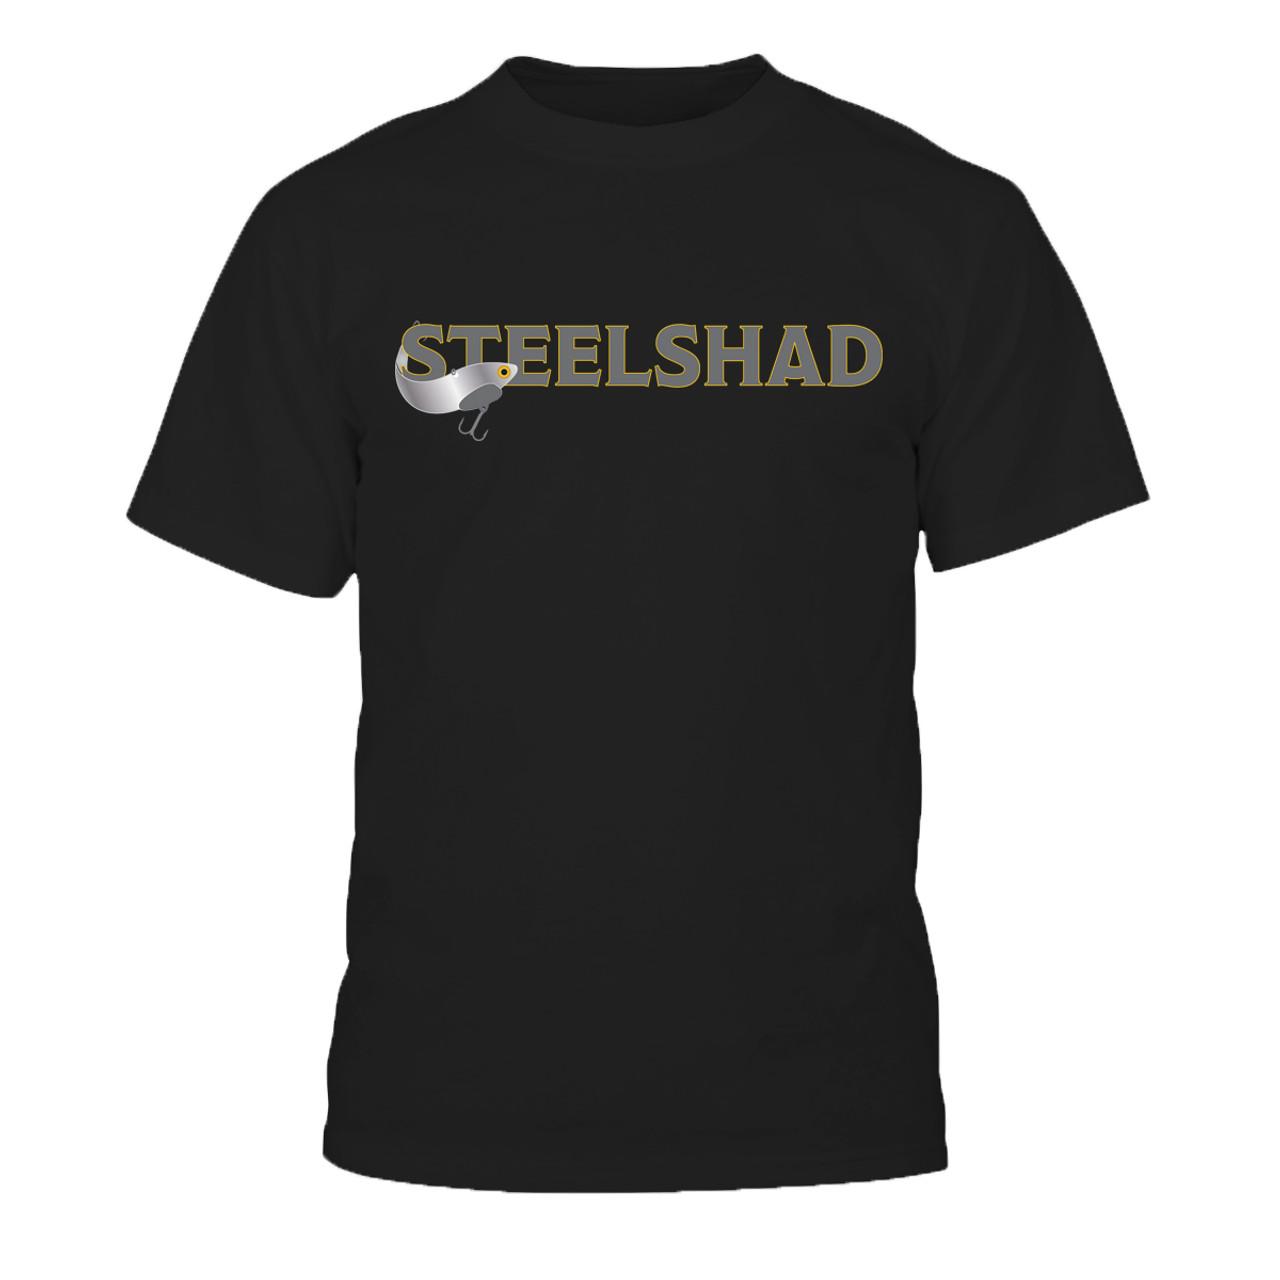 SteelShad Tshirt Front